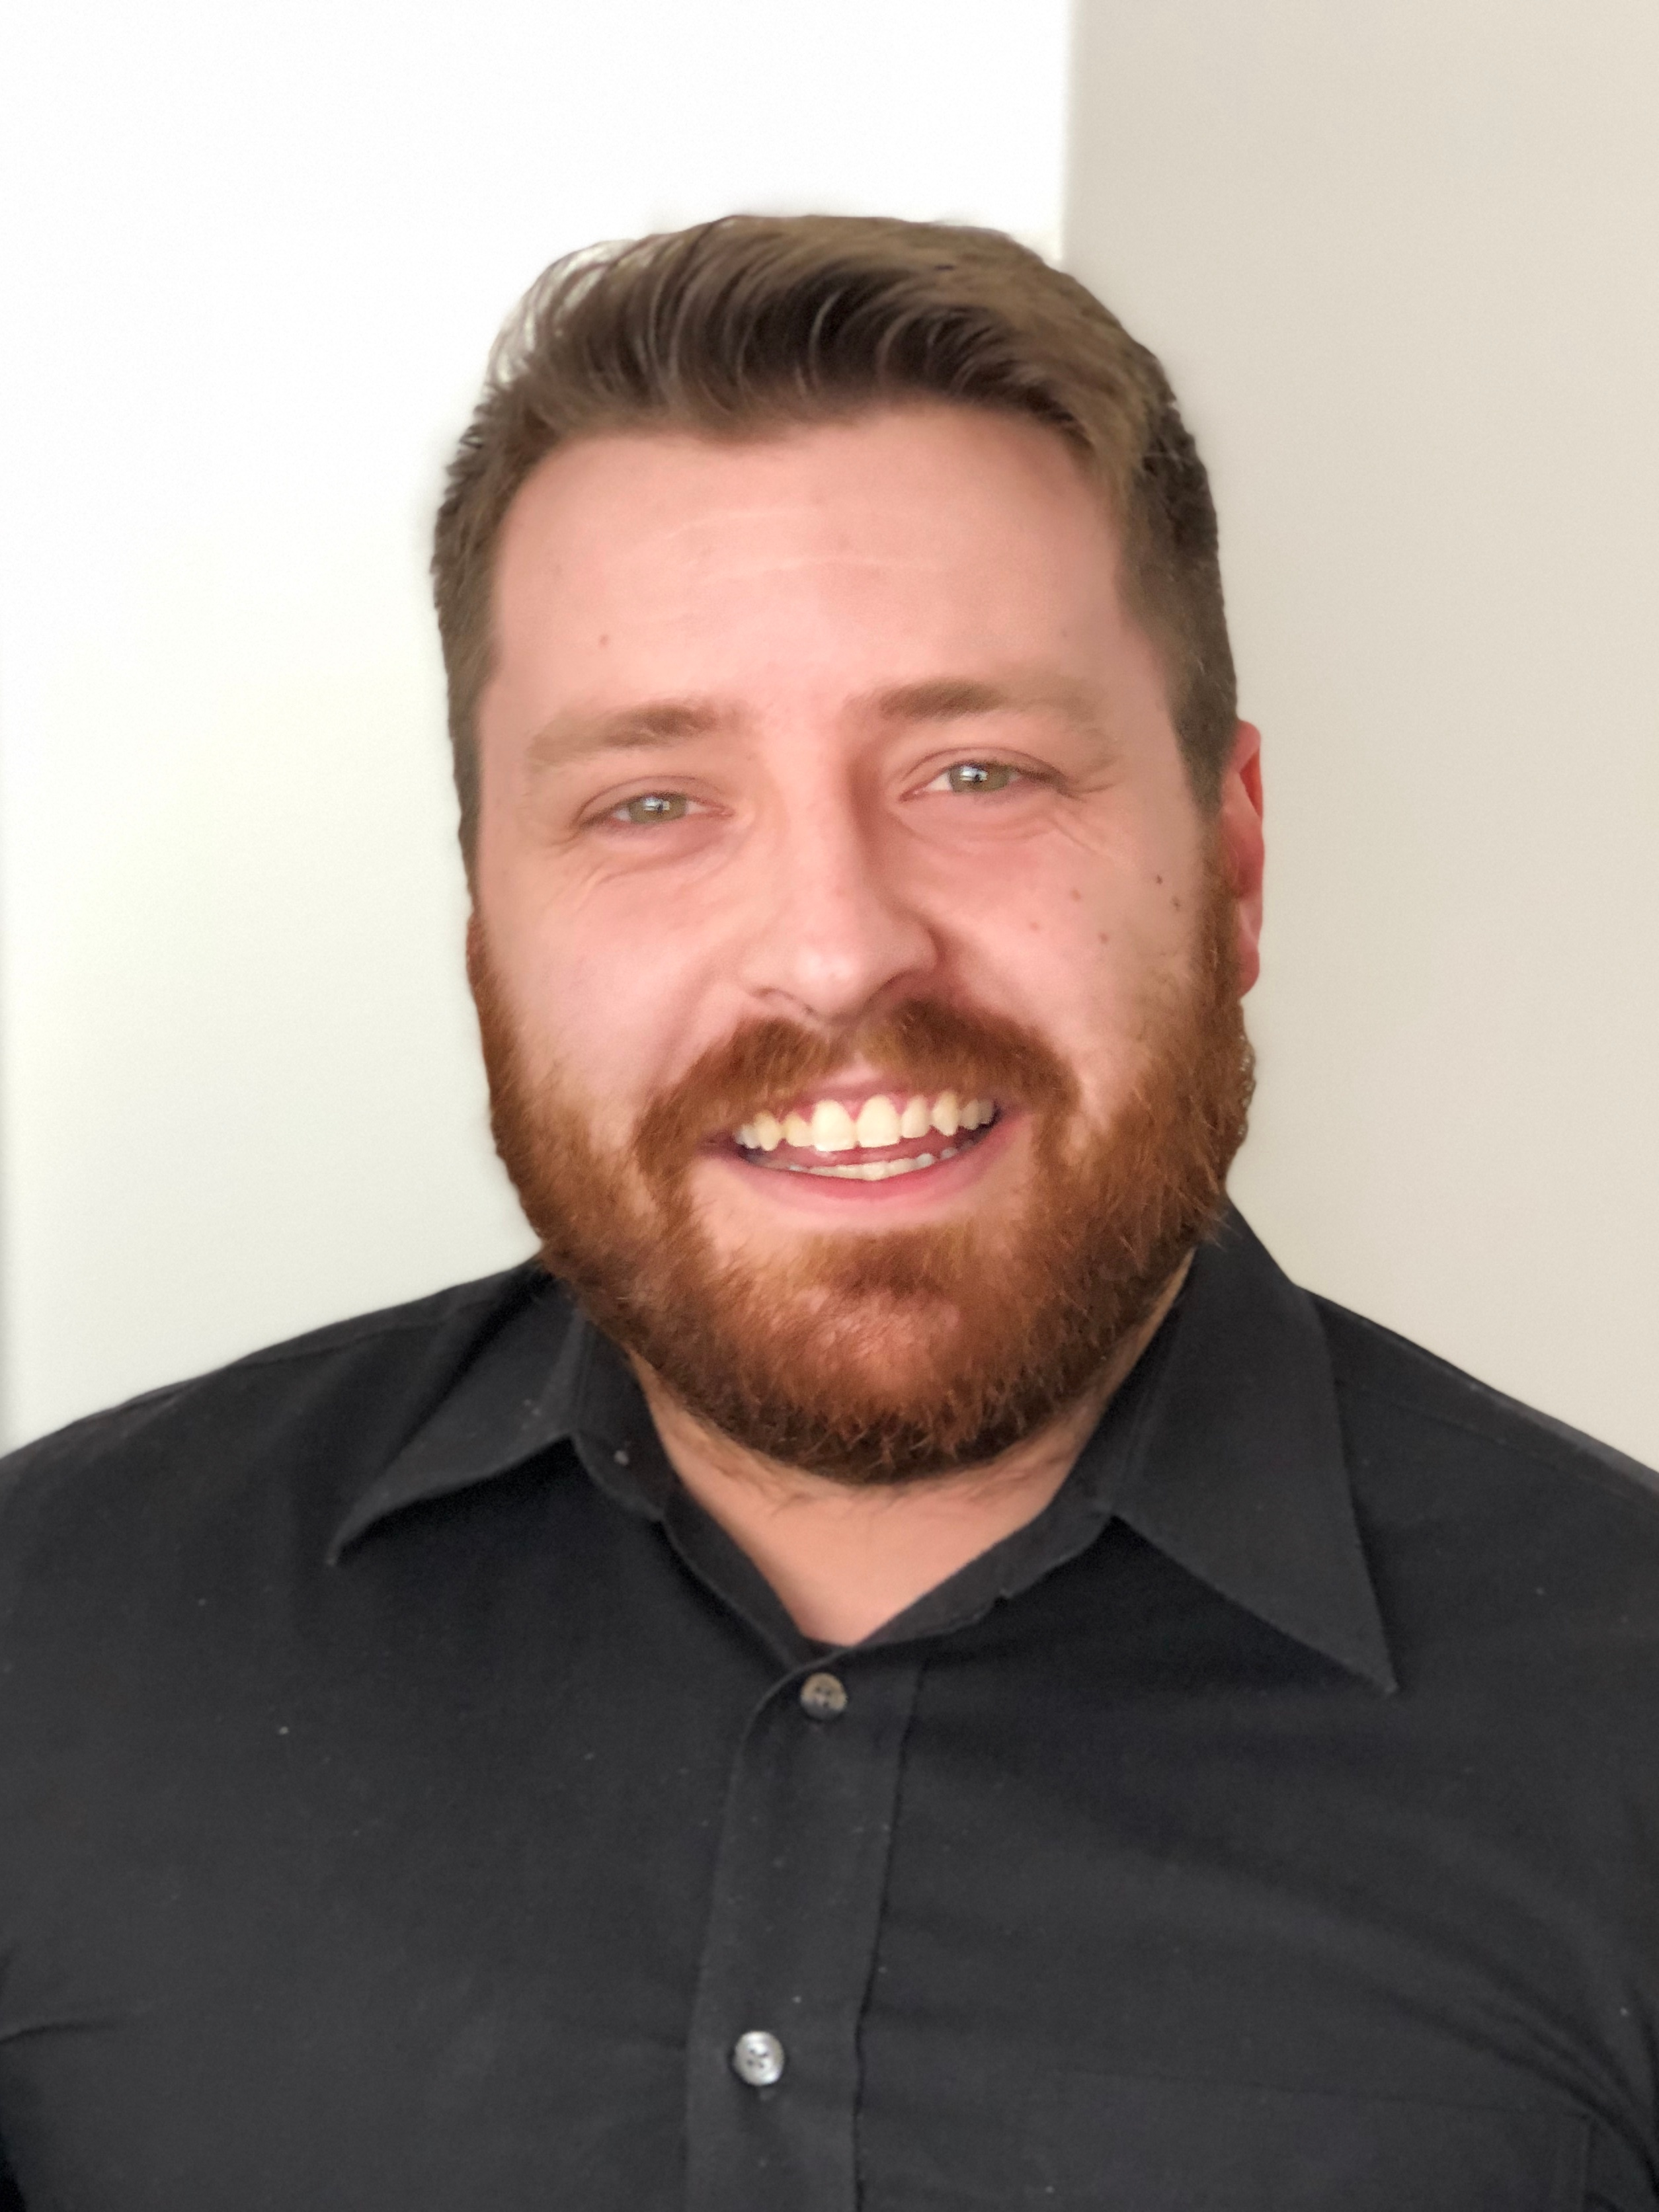 Ryan Heuser